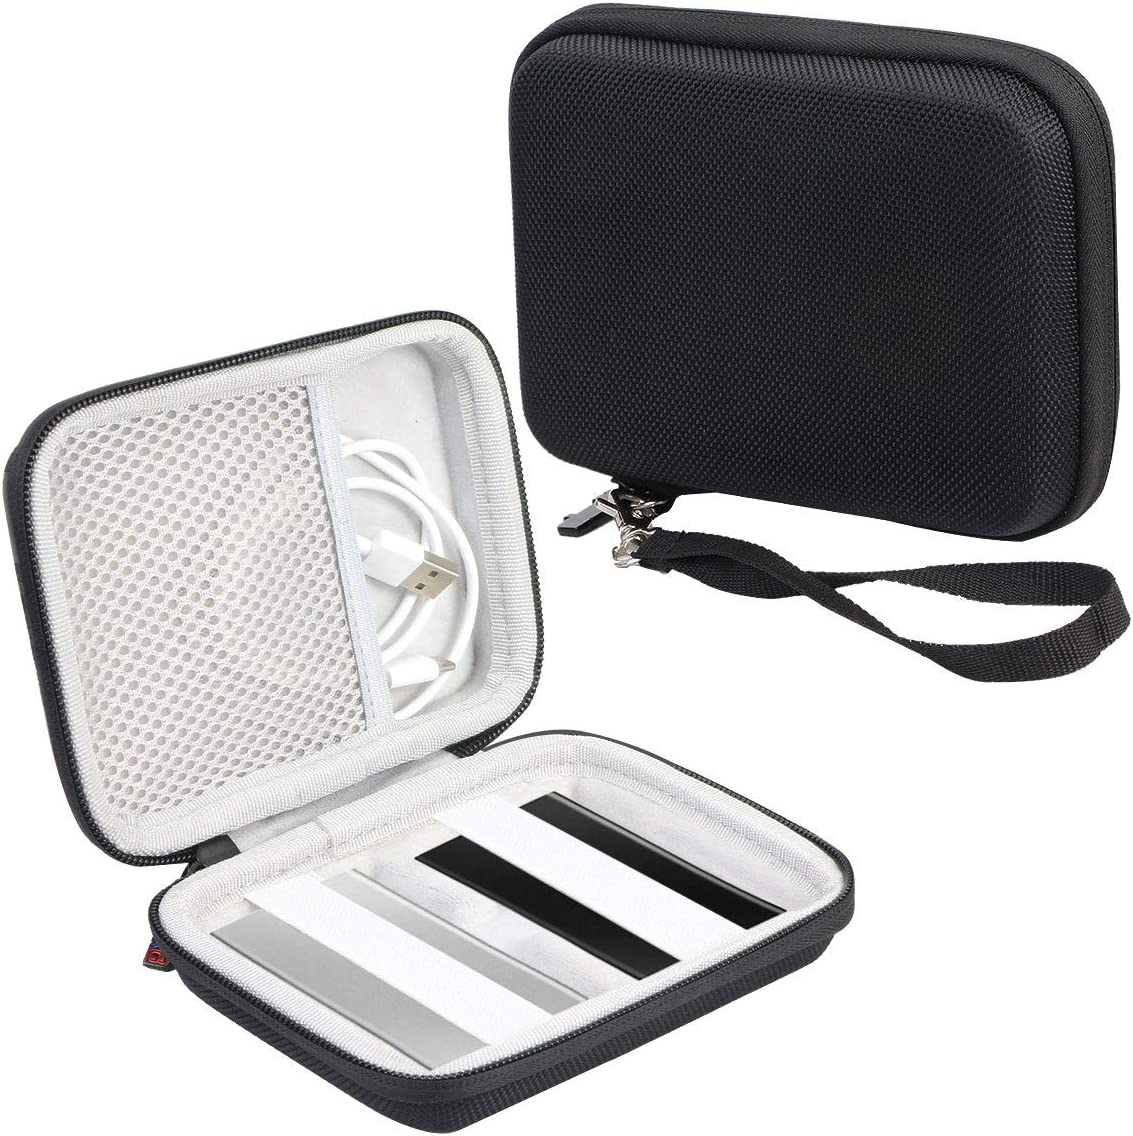 Khanka Hartschalen Schutzhülle Für Samsung T7 Touch Portable Ssd 500 Gb 1 Tb Usb 3 2 Farbe 2 Elektronik